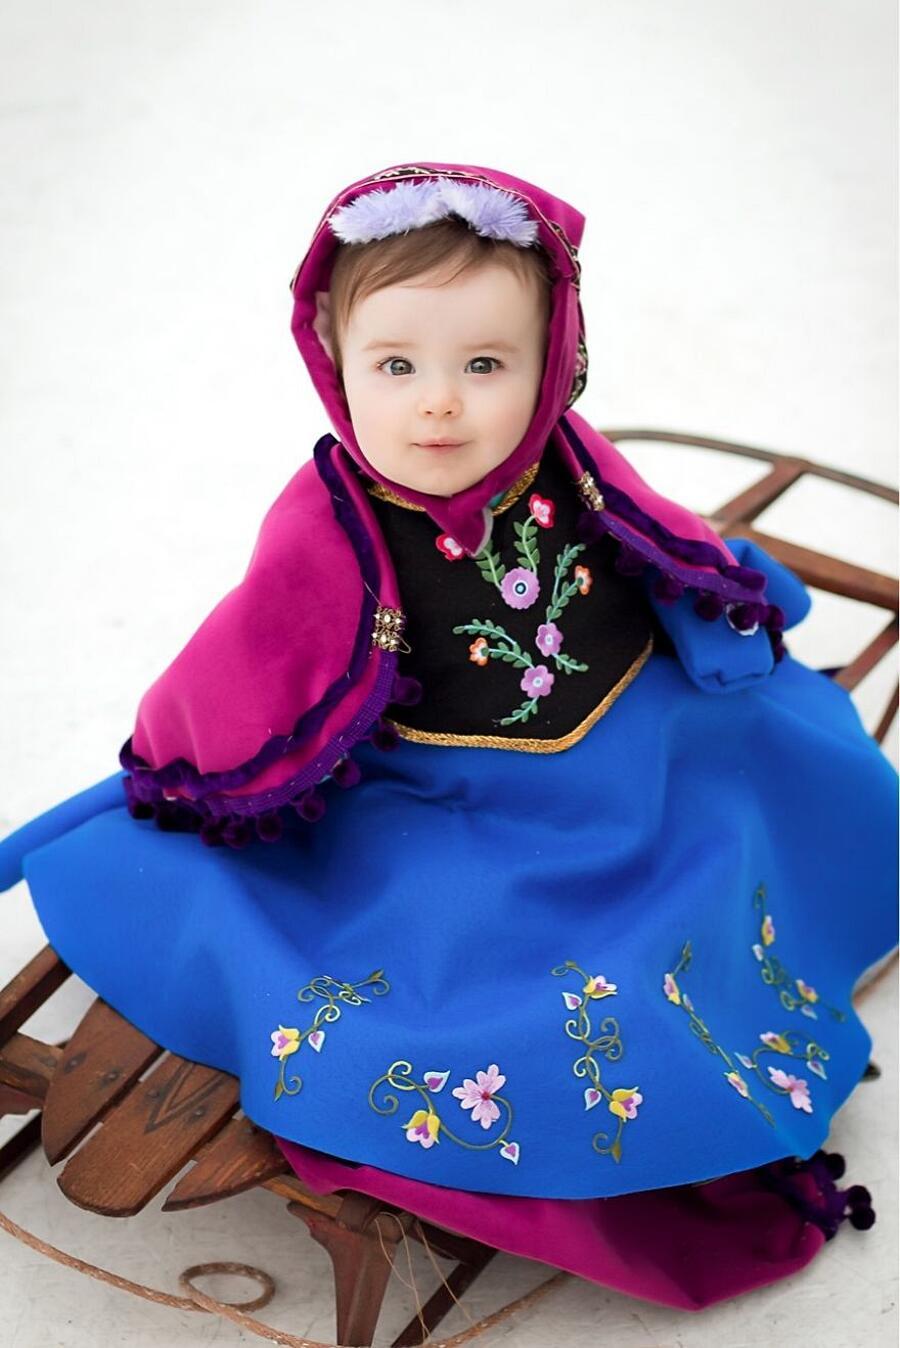 Bambina Vestita Da Principessa Disney Kaenel Photography